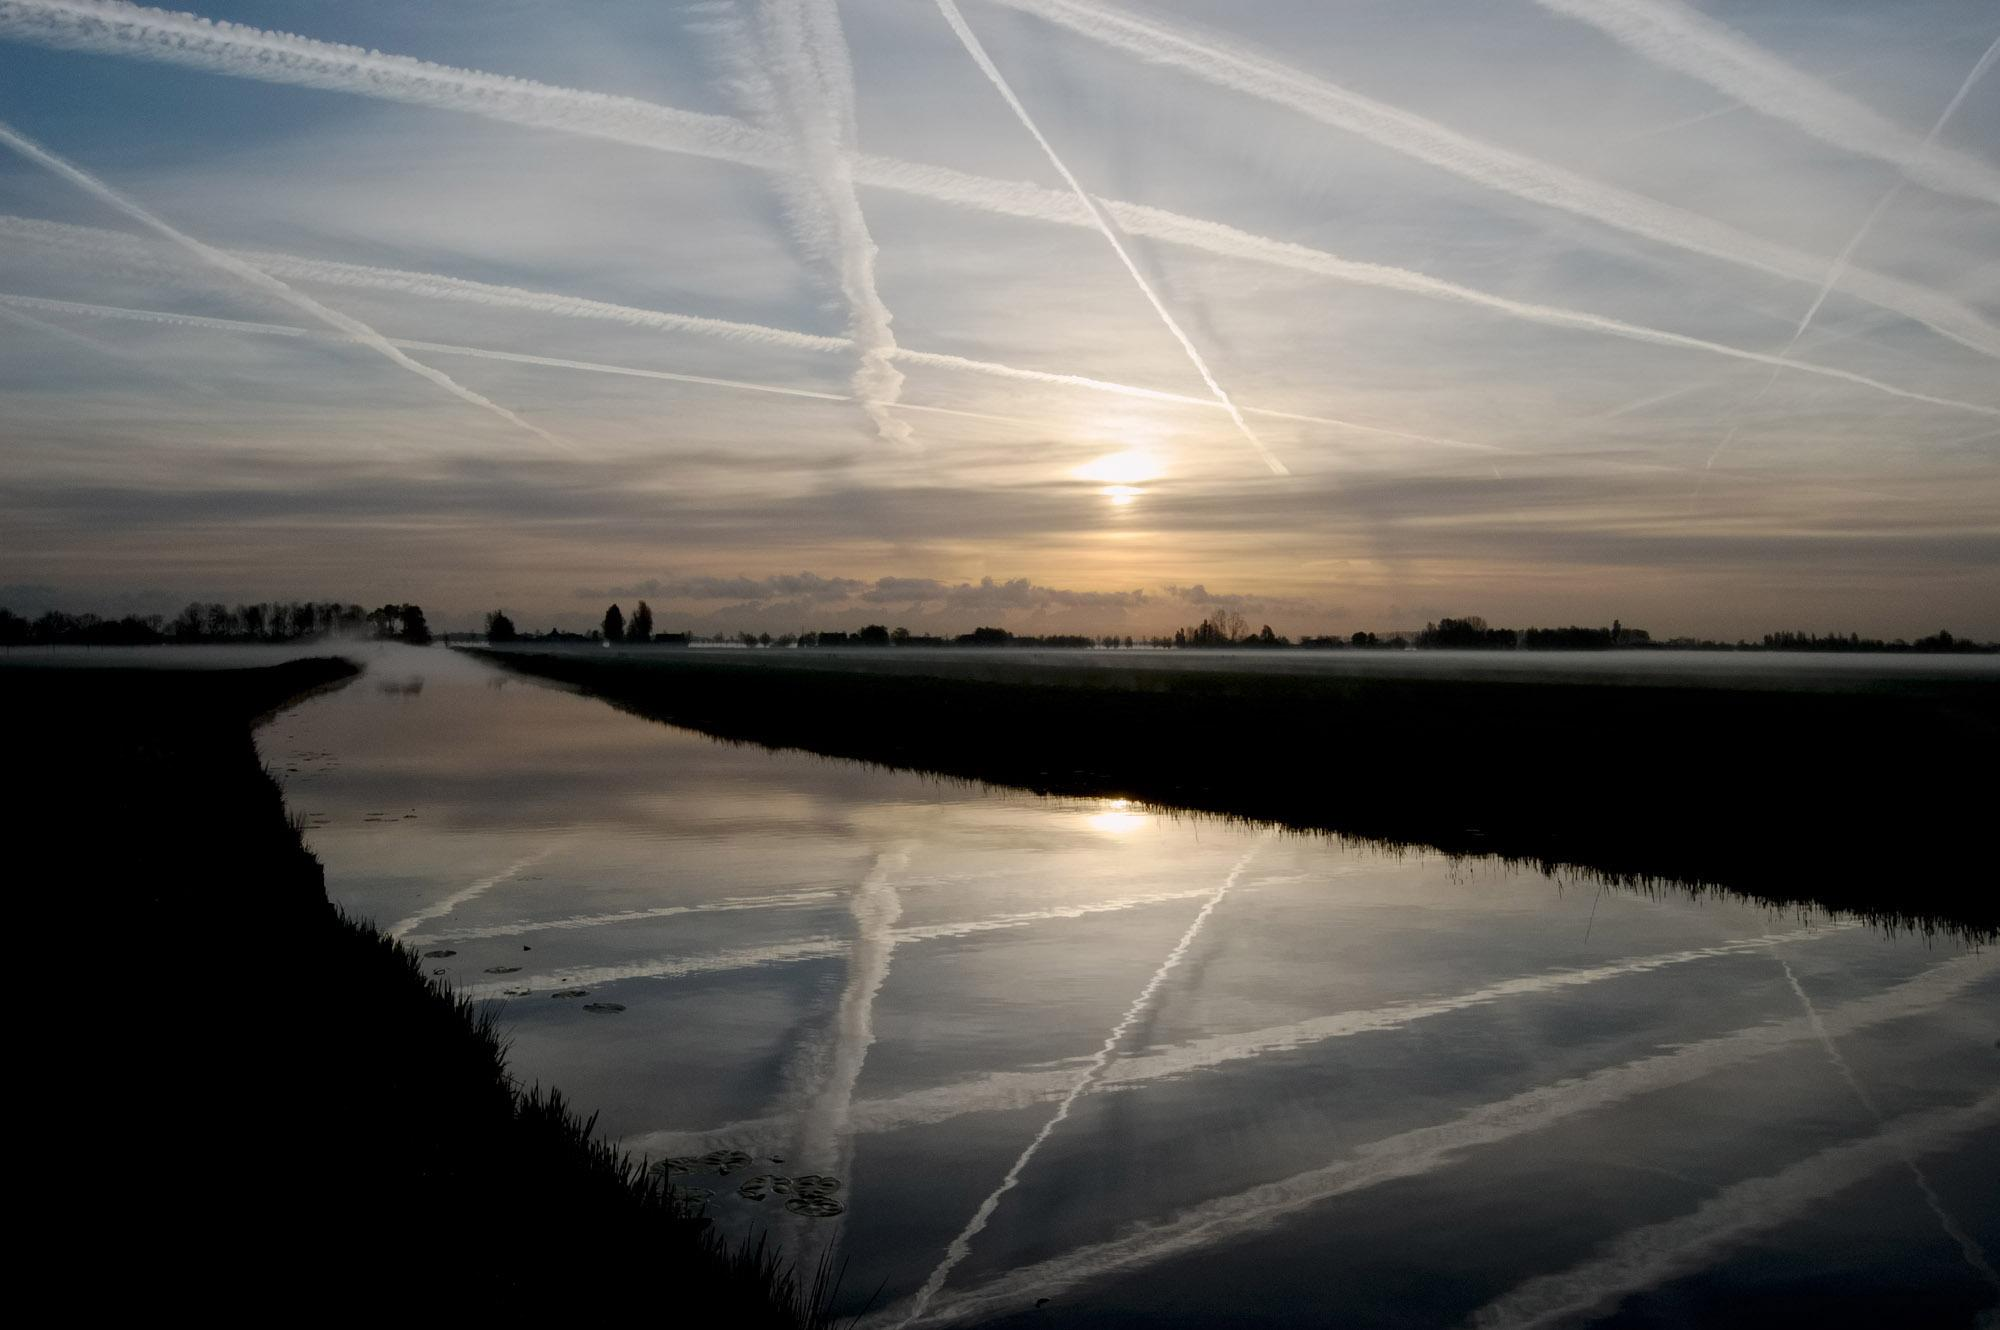 Sunrise above the Cattenbroeker Polder and the Montfoorts Canal. Linschoten, Utrecht, The Netherlands. April 2007.